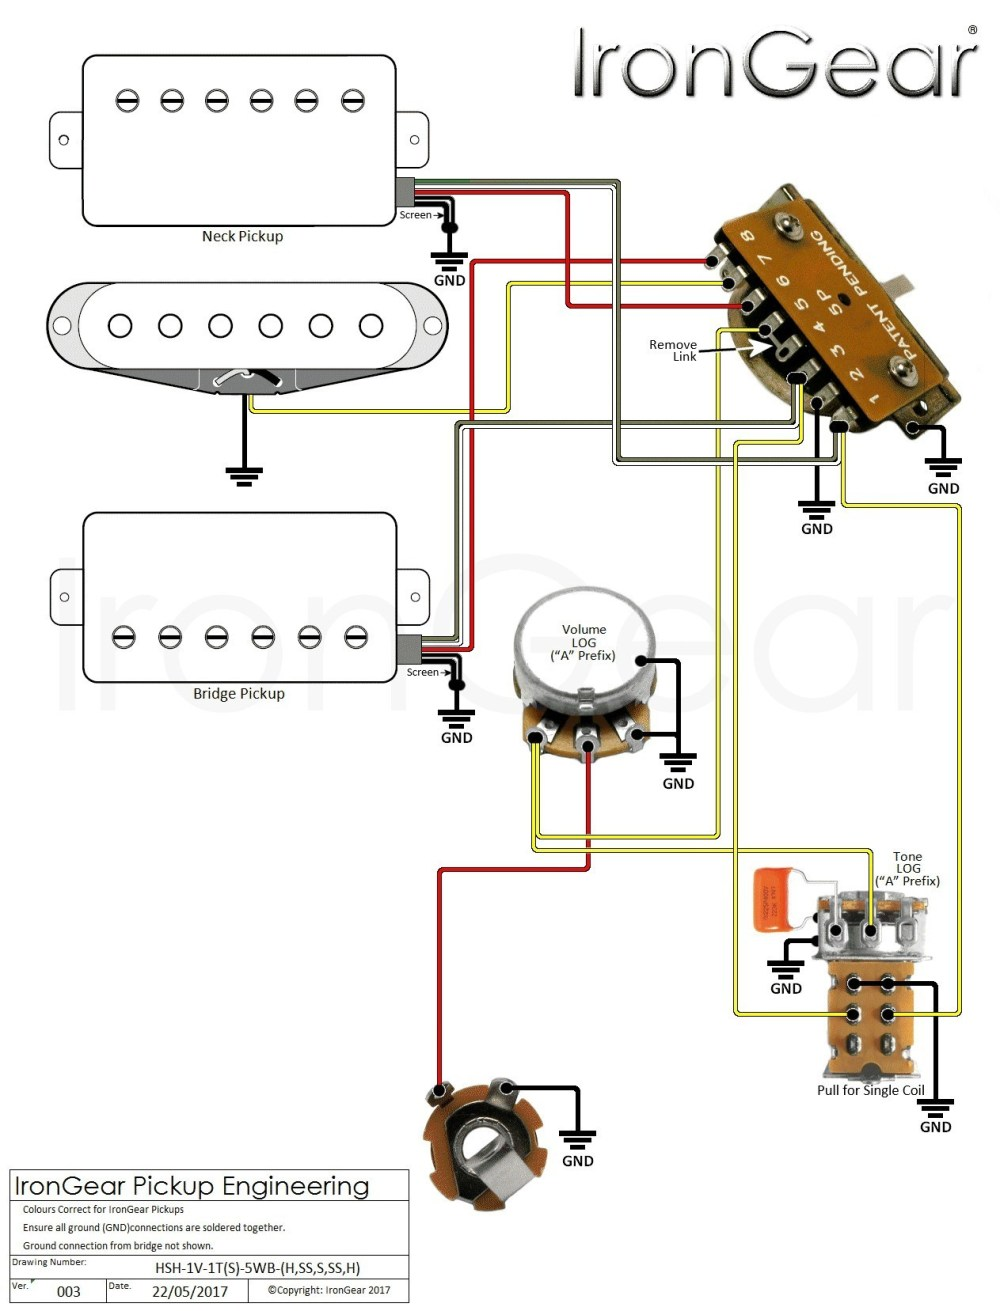 medium resolution of wiring diagram guitar pickups new wiring diagram 3 pickup guitar new guitar wiring diagram 2 humbucker emg